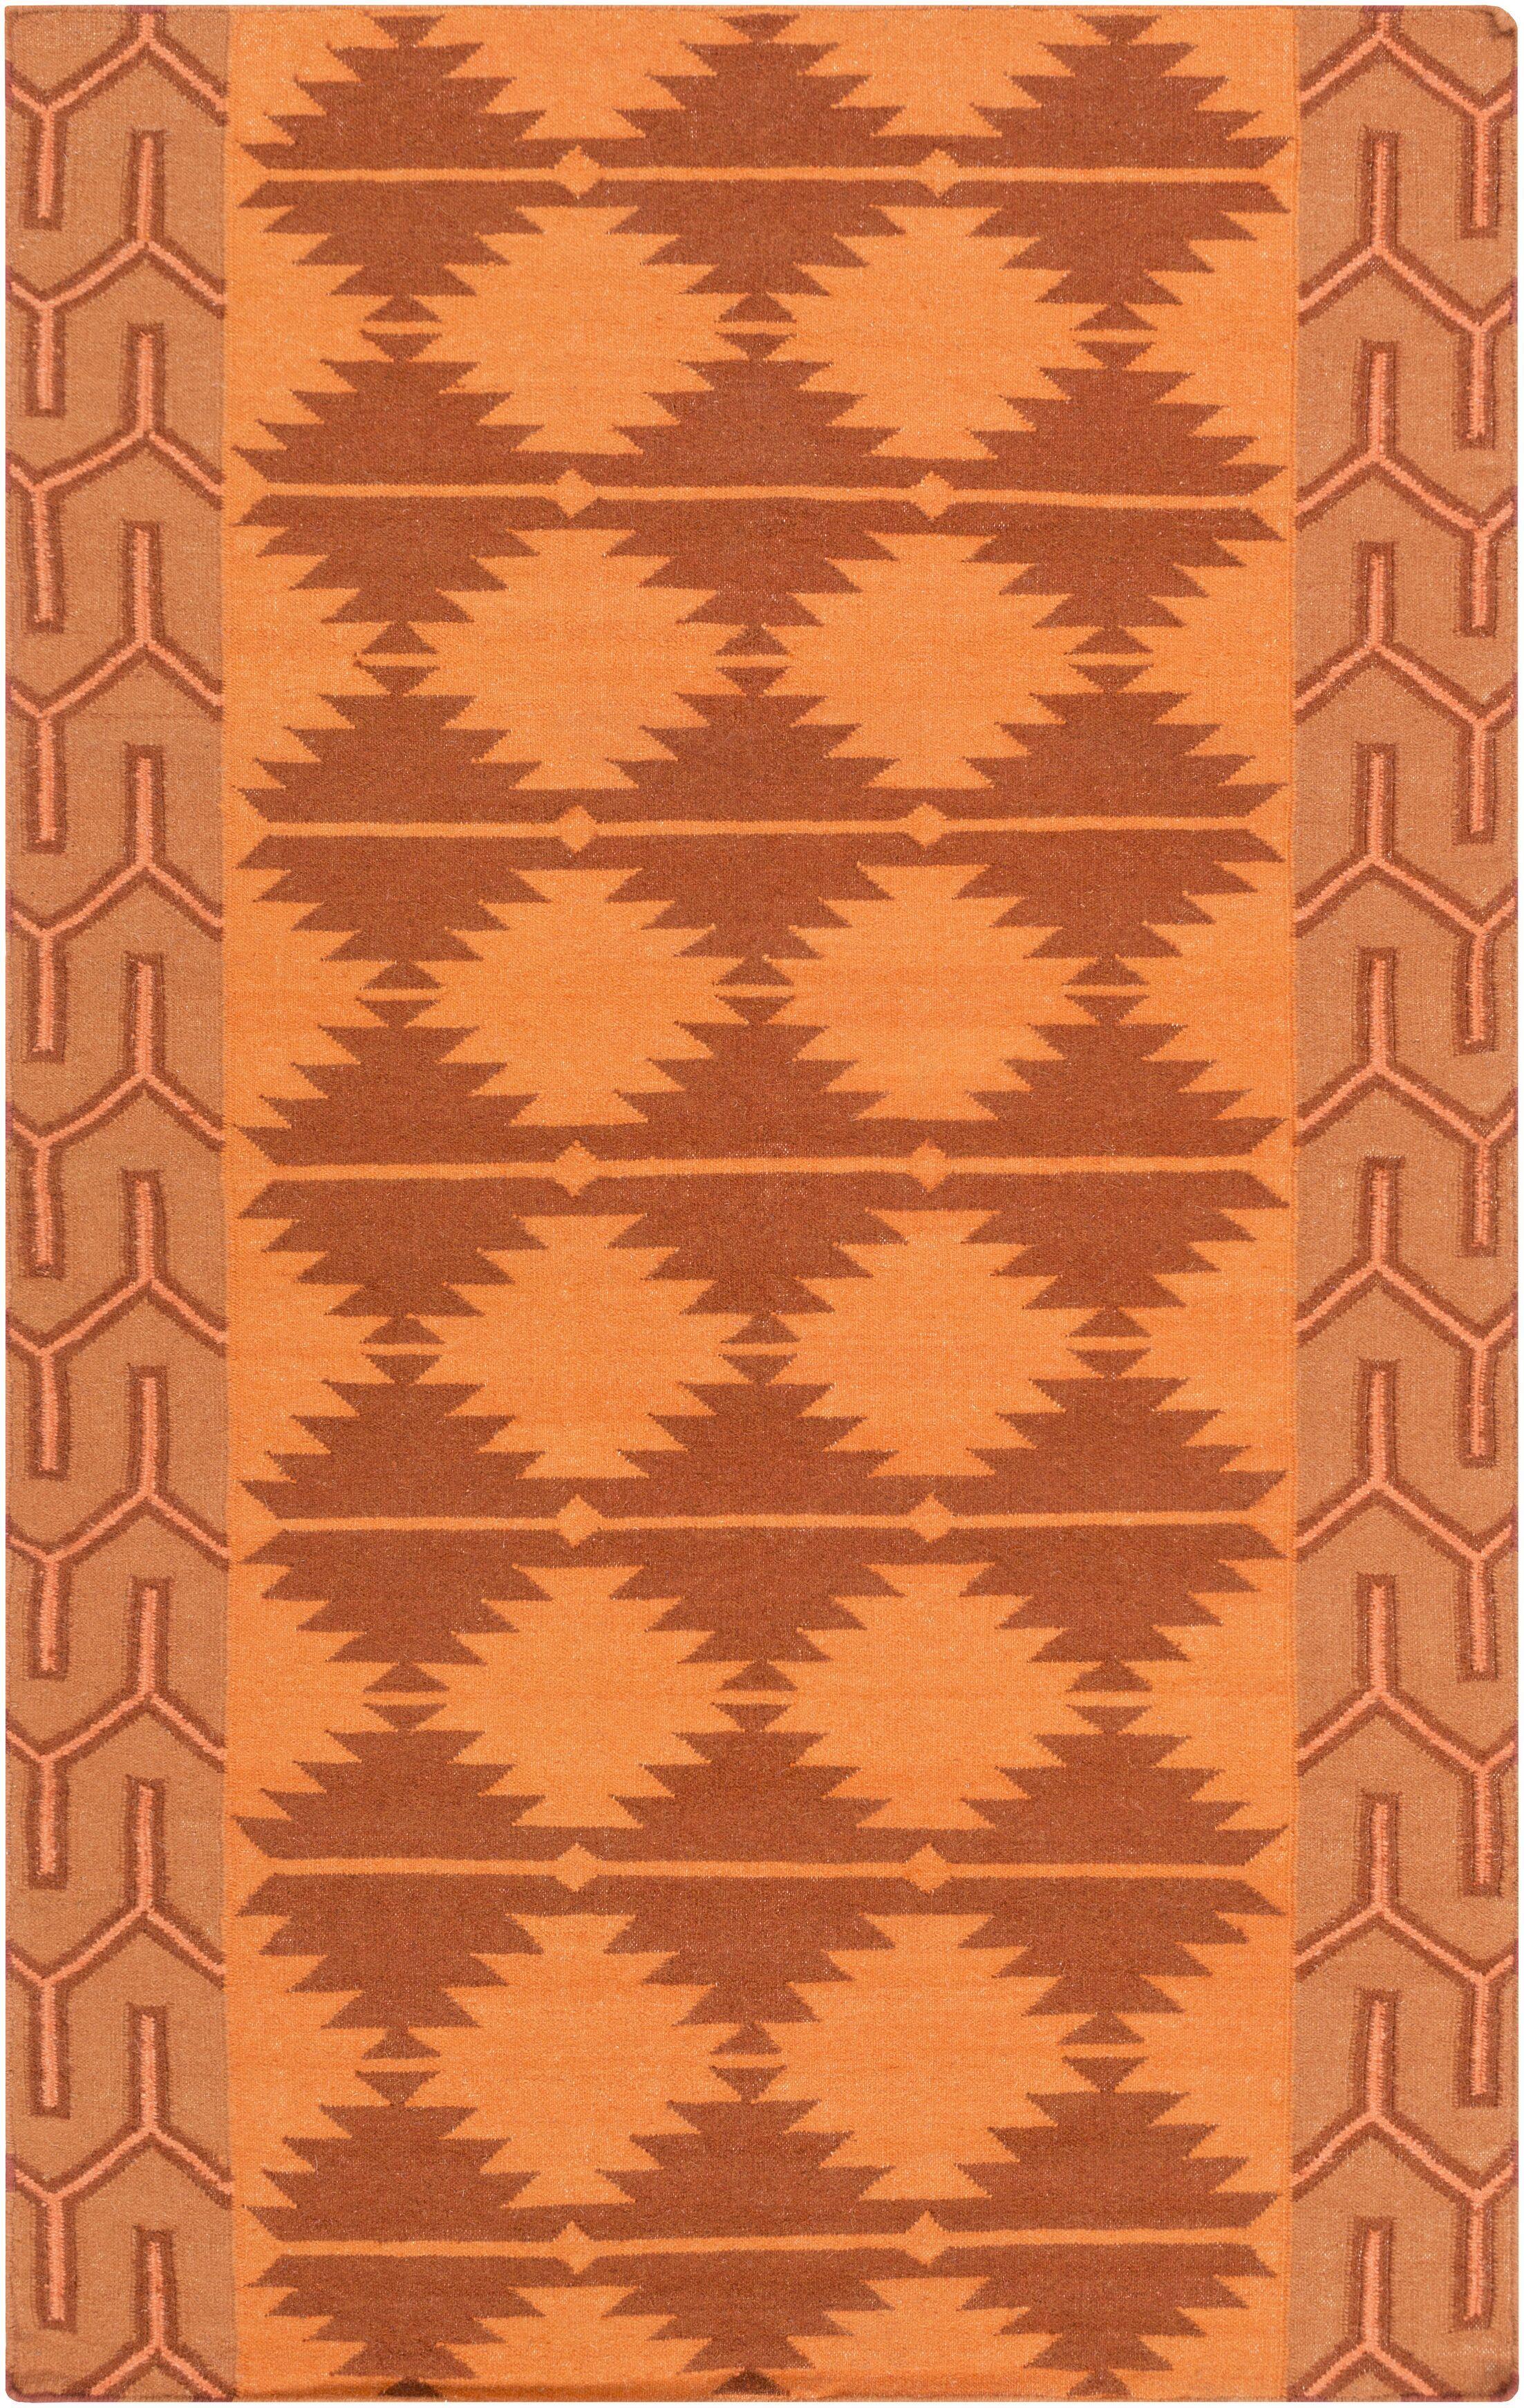 Lewis Burnt Orange Area Rug Rug Size: Rectangle 8' x 11'